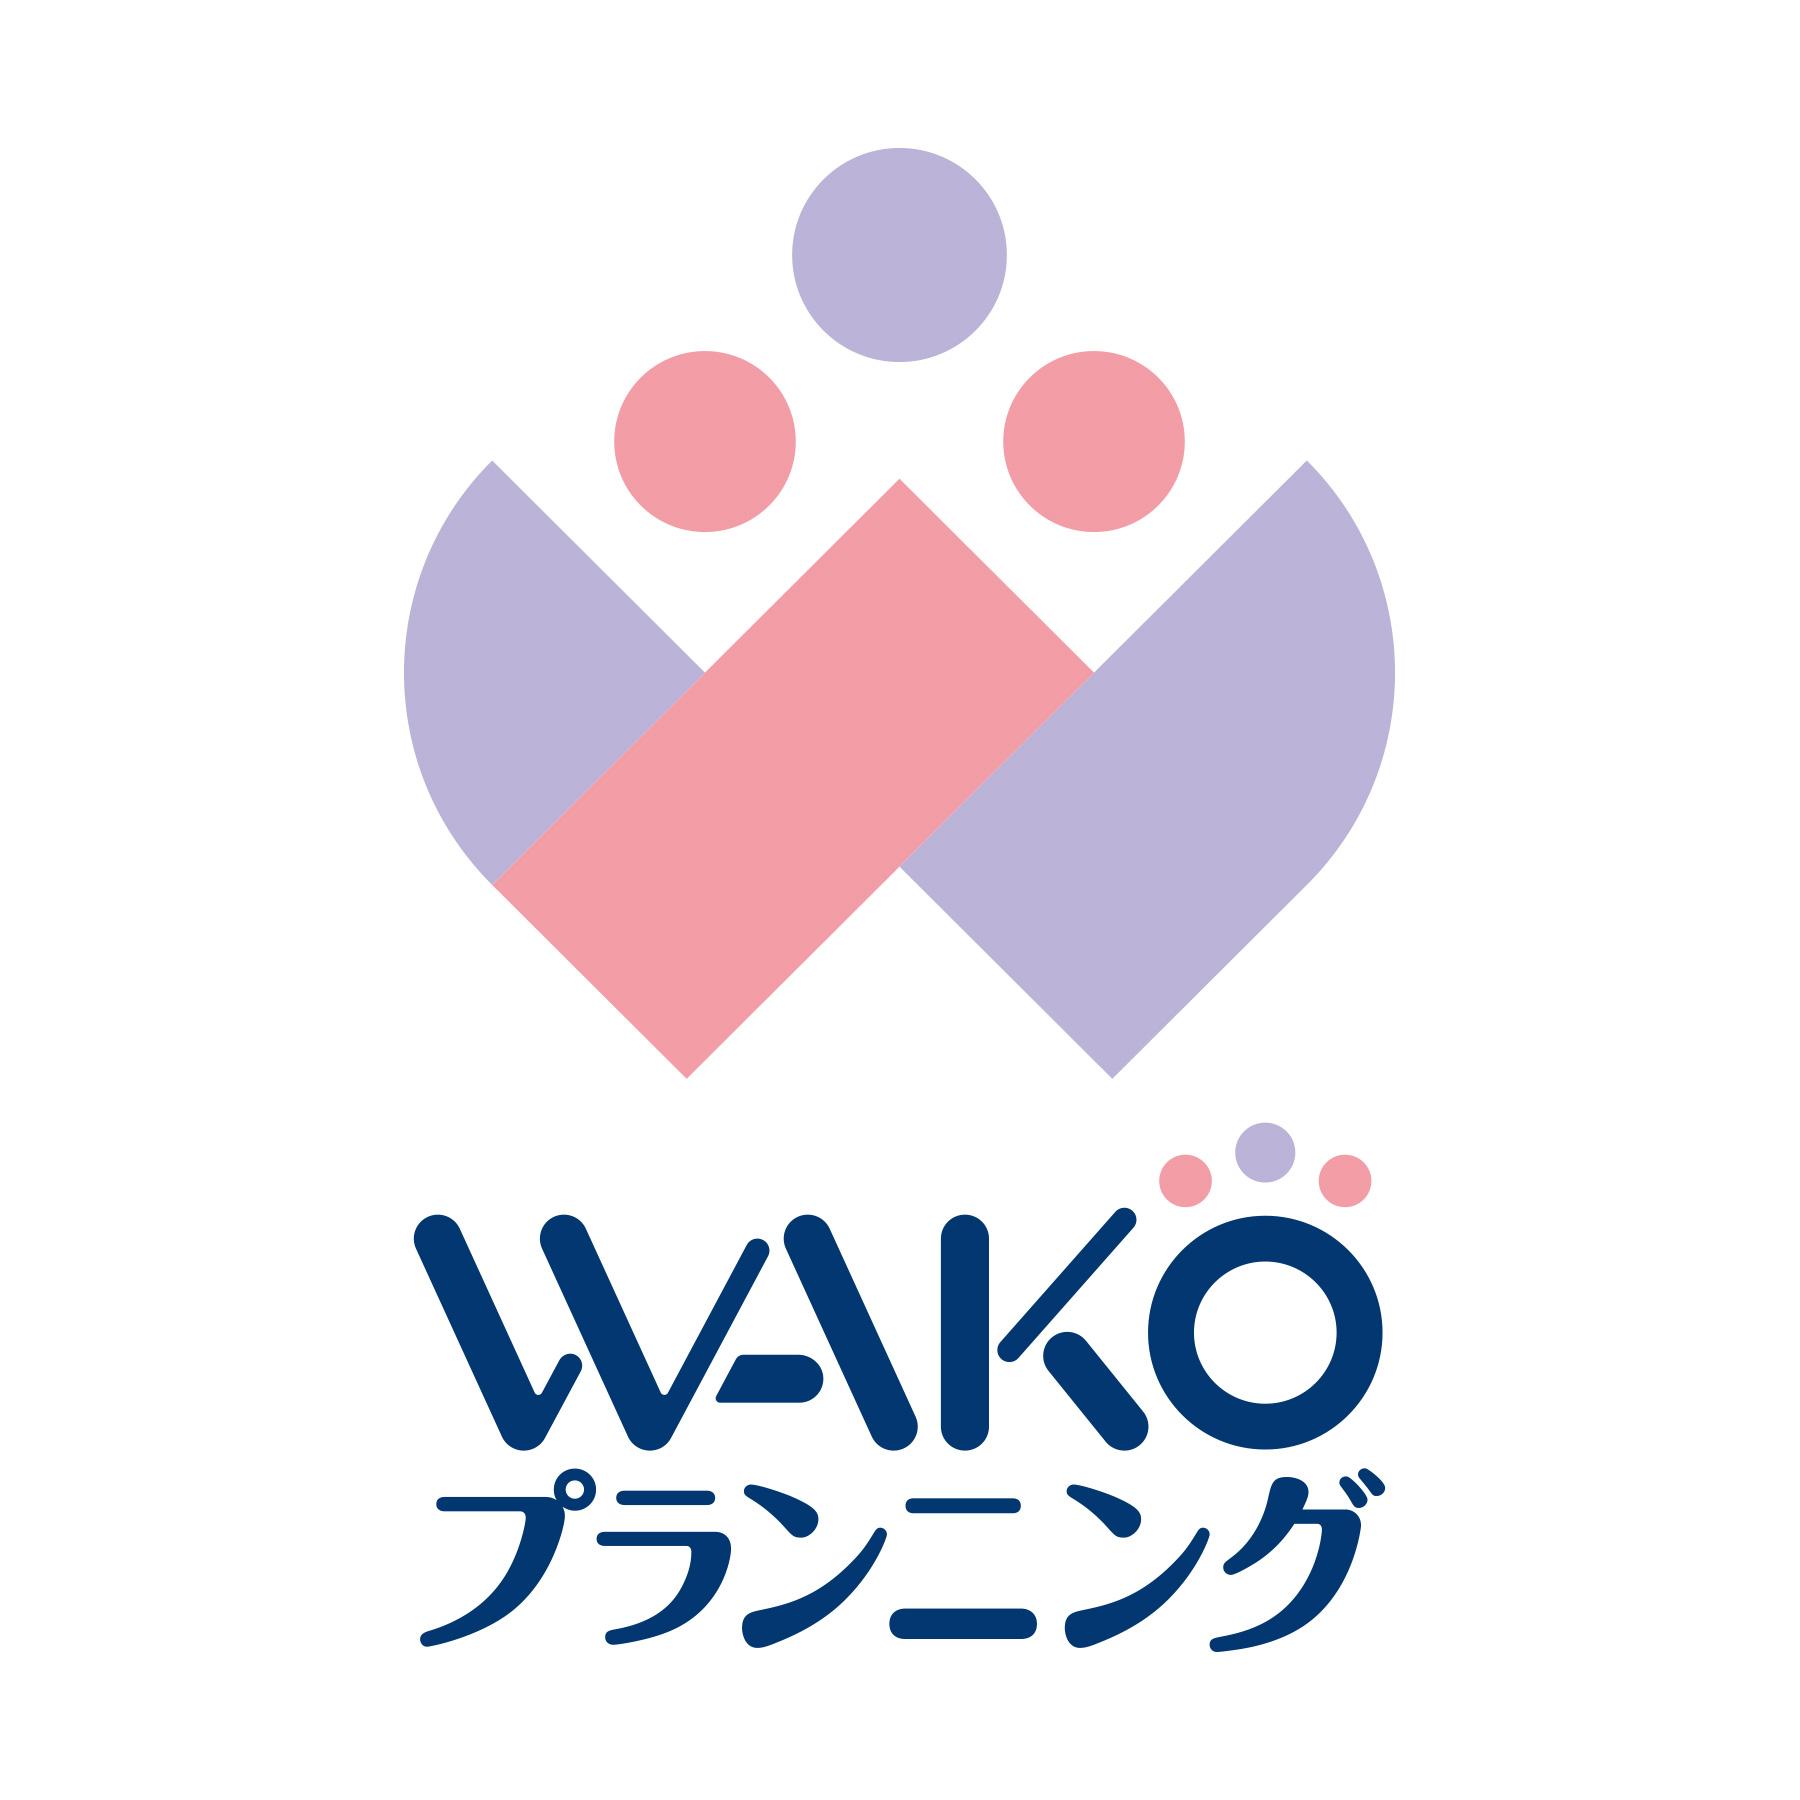 WAKOプラニング,不動産,ロゴ